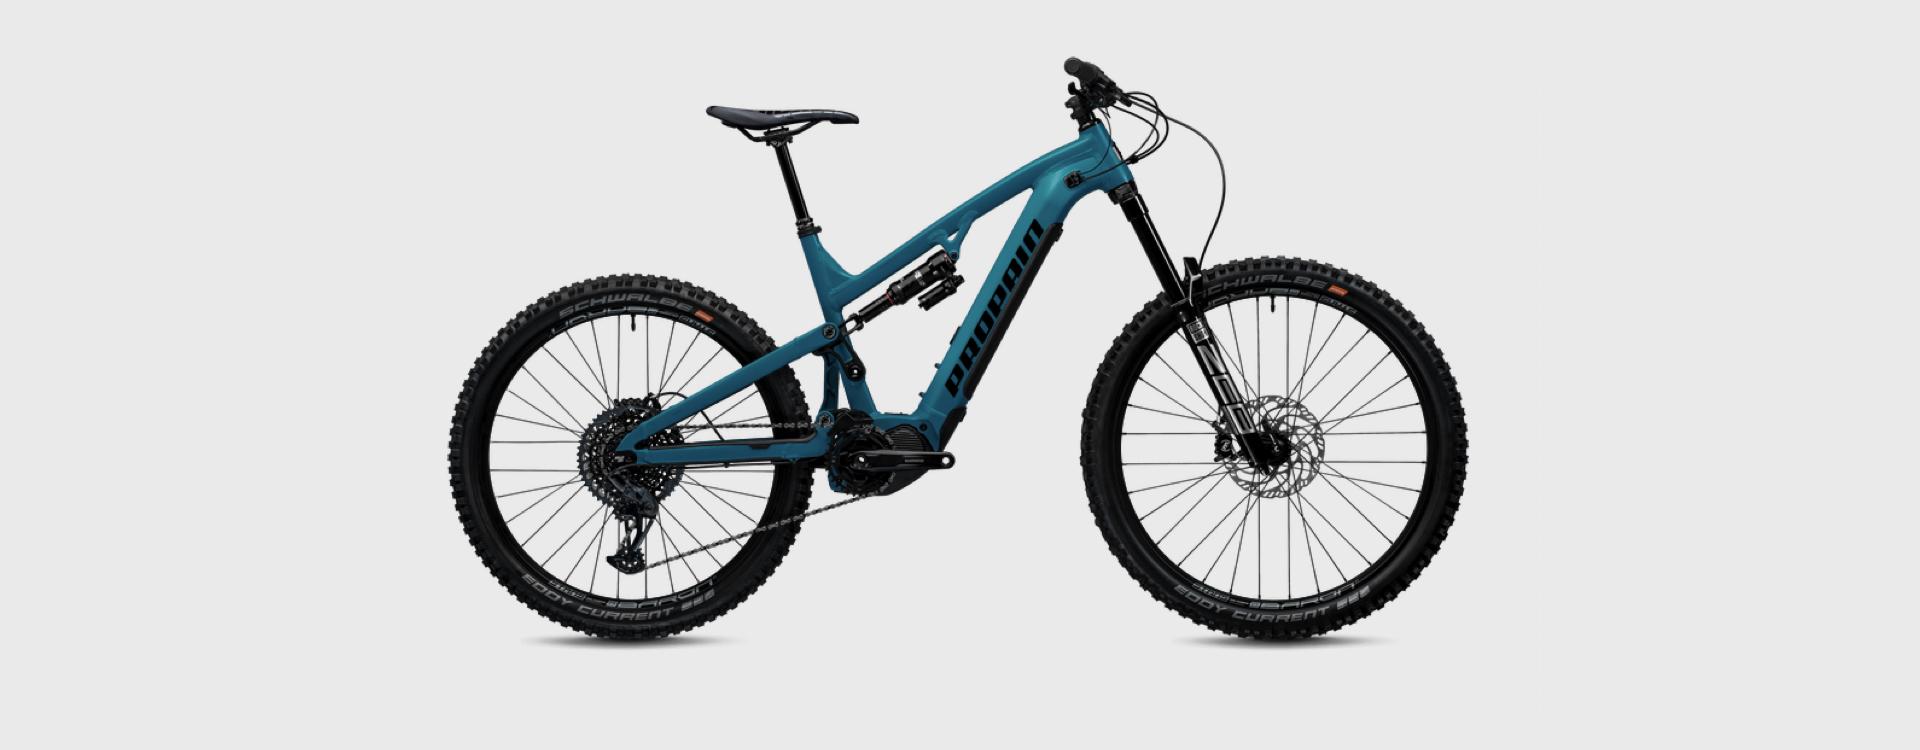 Bike Verleih Gummersbach Propain Bikes Testcenter NRW Ekano 3 - AL - M - 650B - Petrol - 1920x750